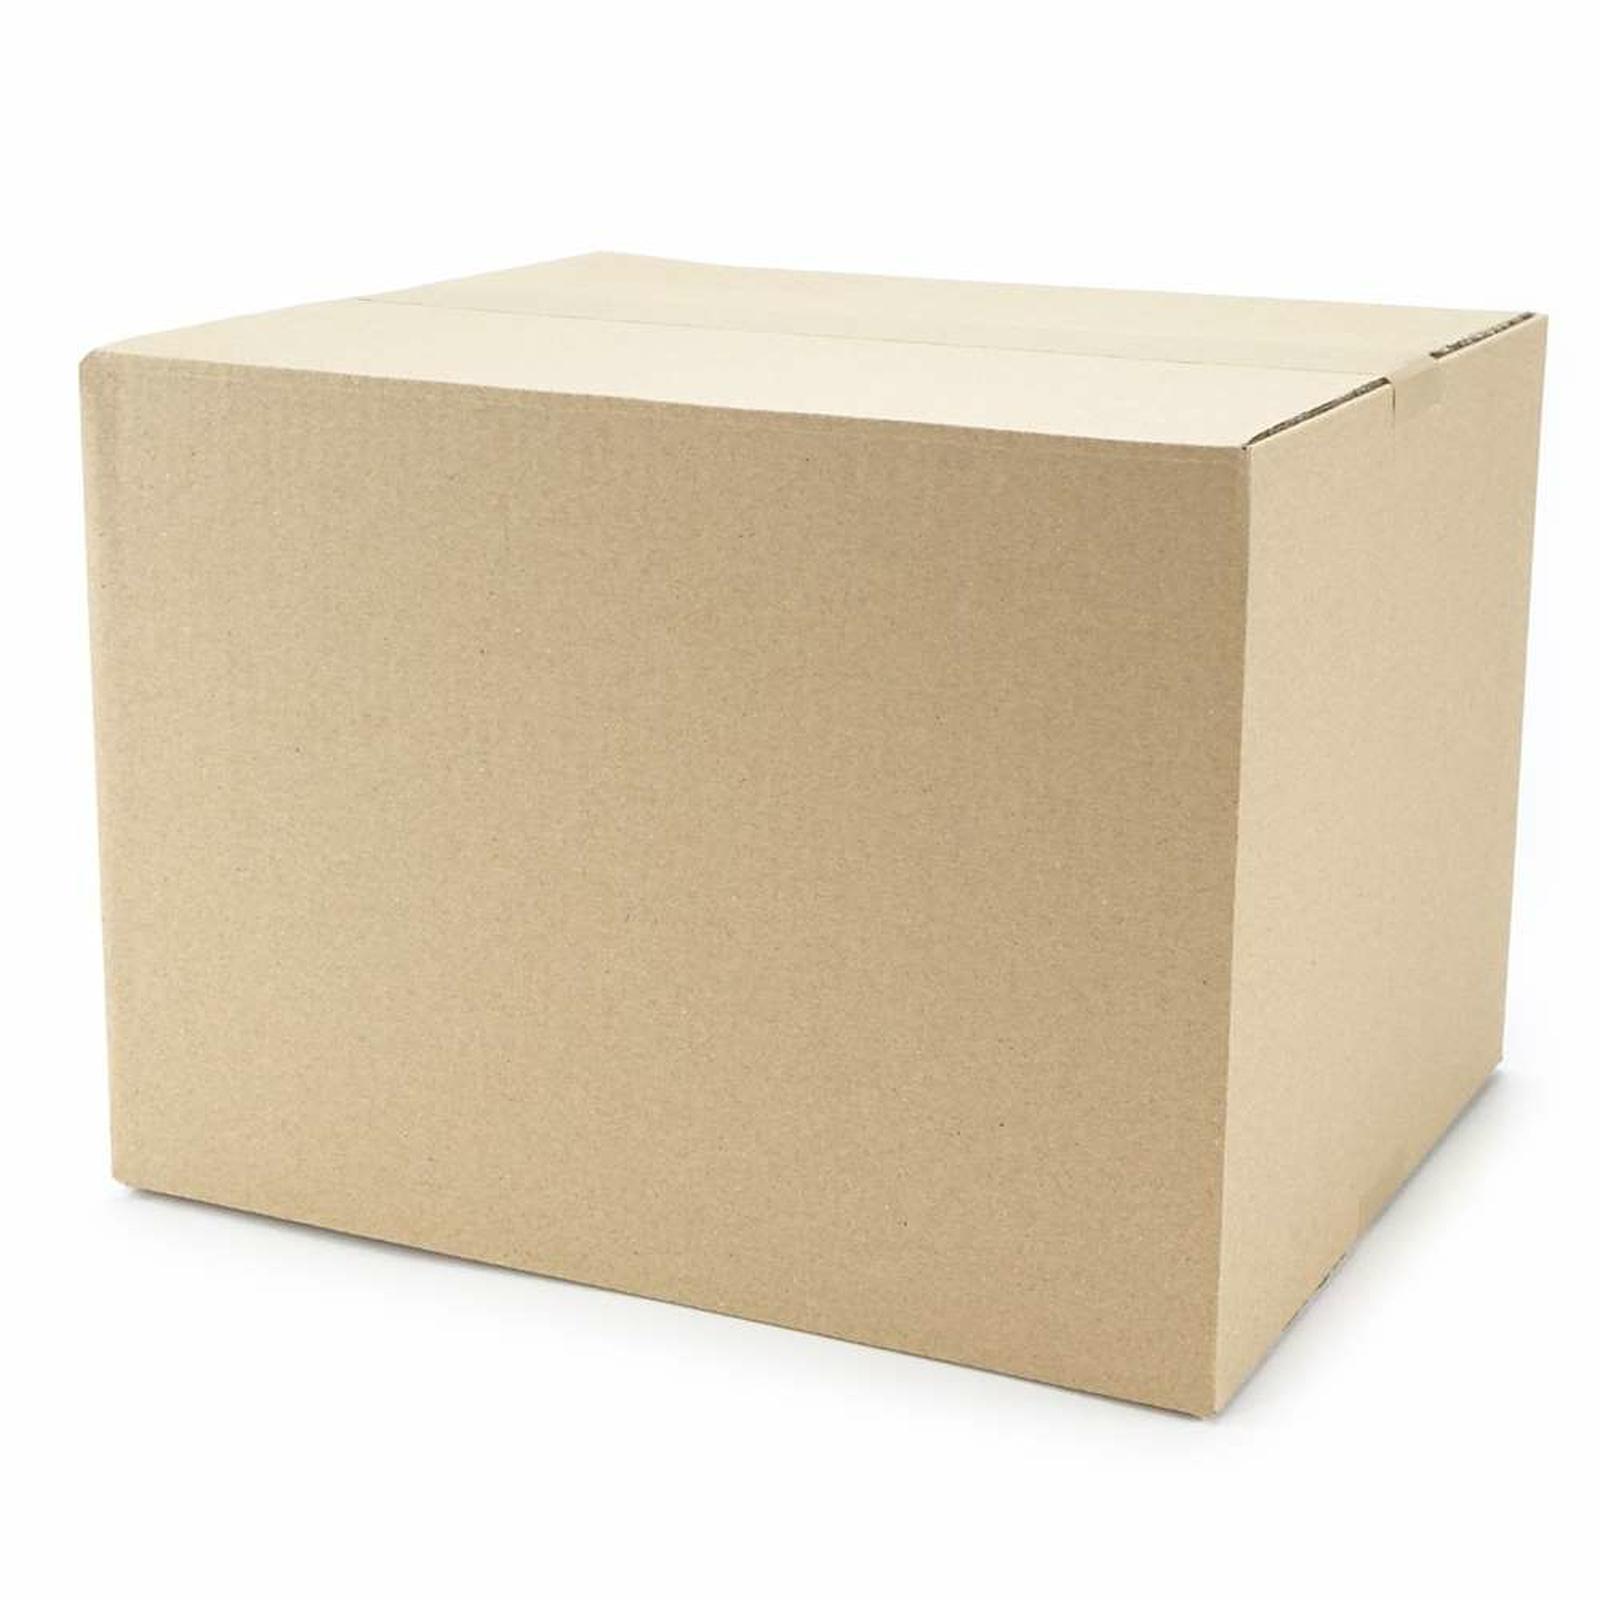 einwellige kartons 350x300x250 mm g nstig kaufen 0 52. Black Bedroom Furniture Sets. Home Design Ideas